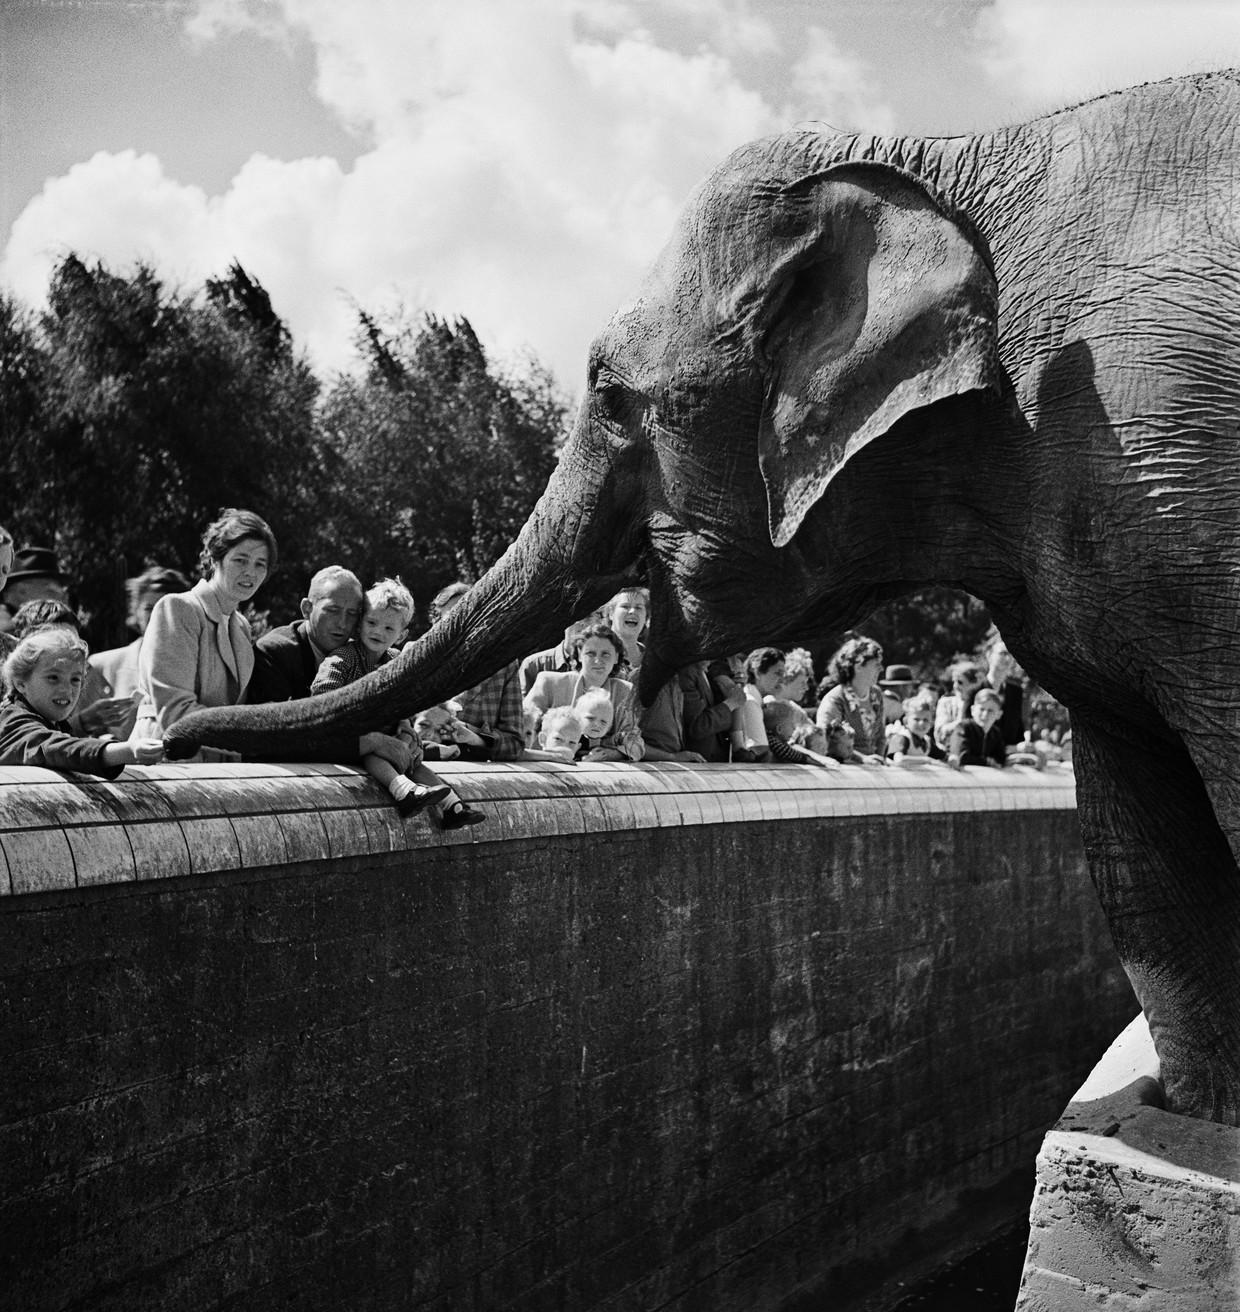 Diergaarde Blijdorp, 1952-1953. Beeld Steef Zoetmulder/Nederlands Fotomuseum